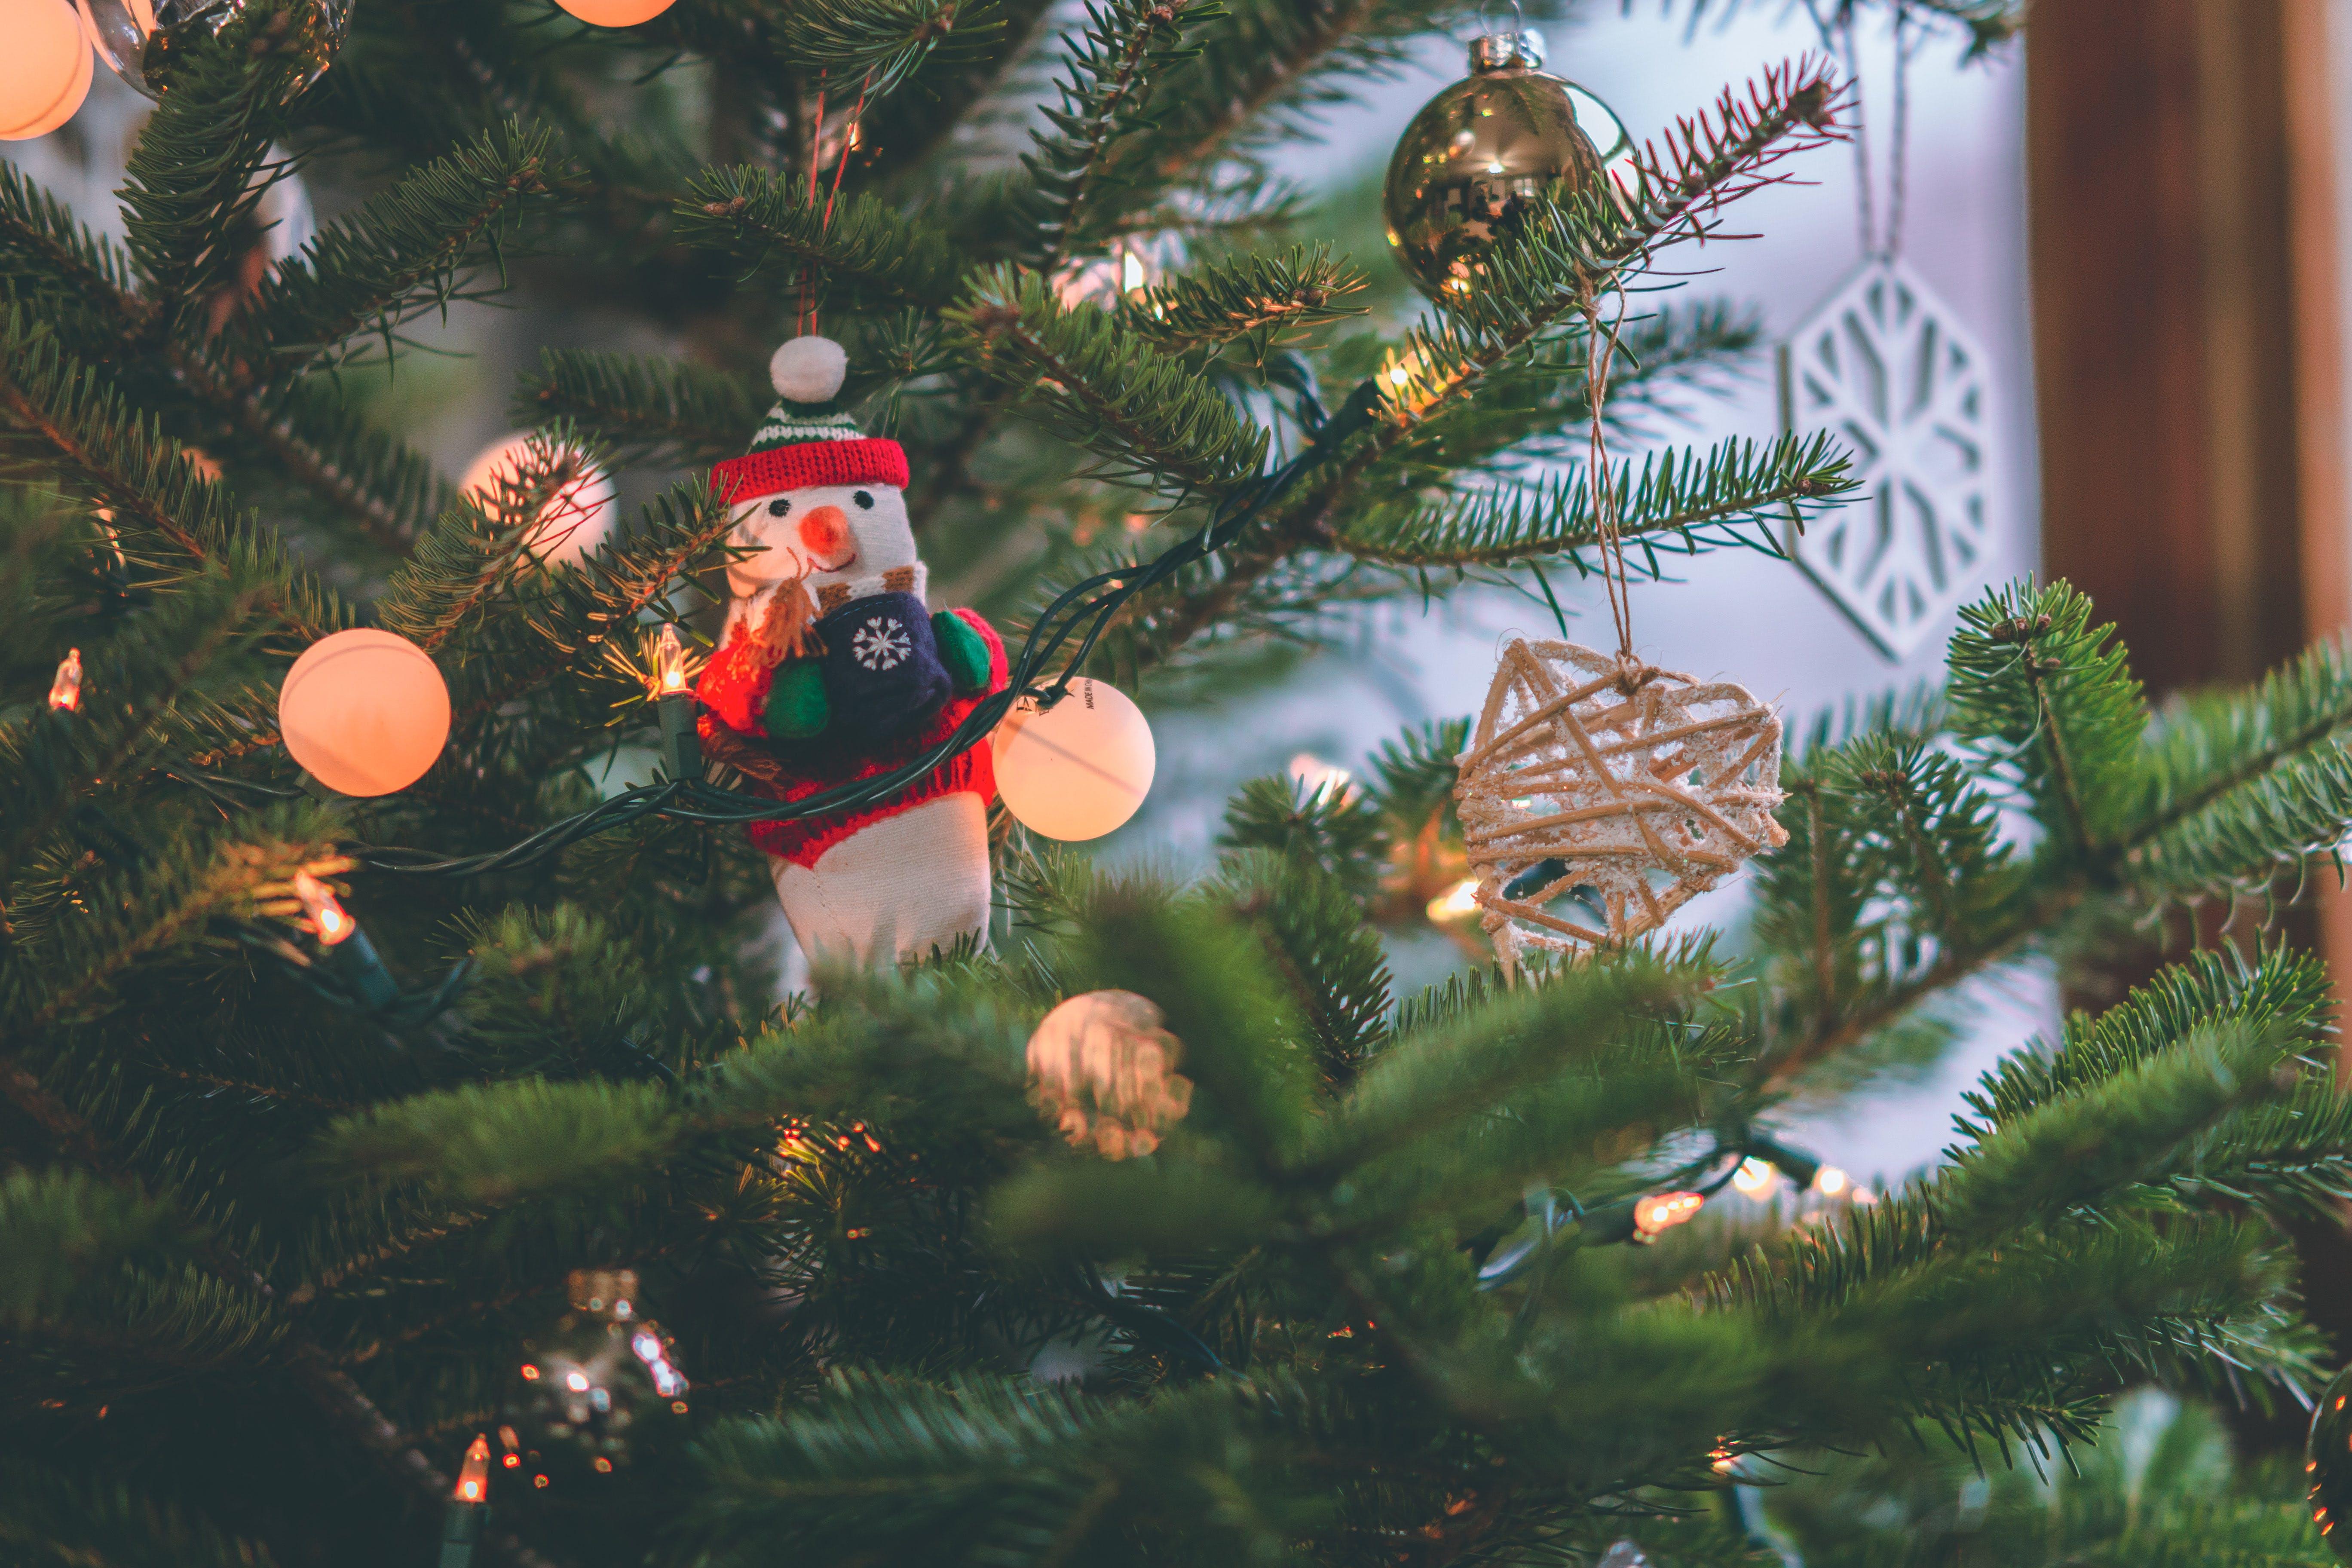 Snowman Decor on Christmas Tree